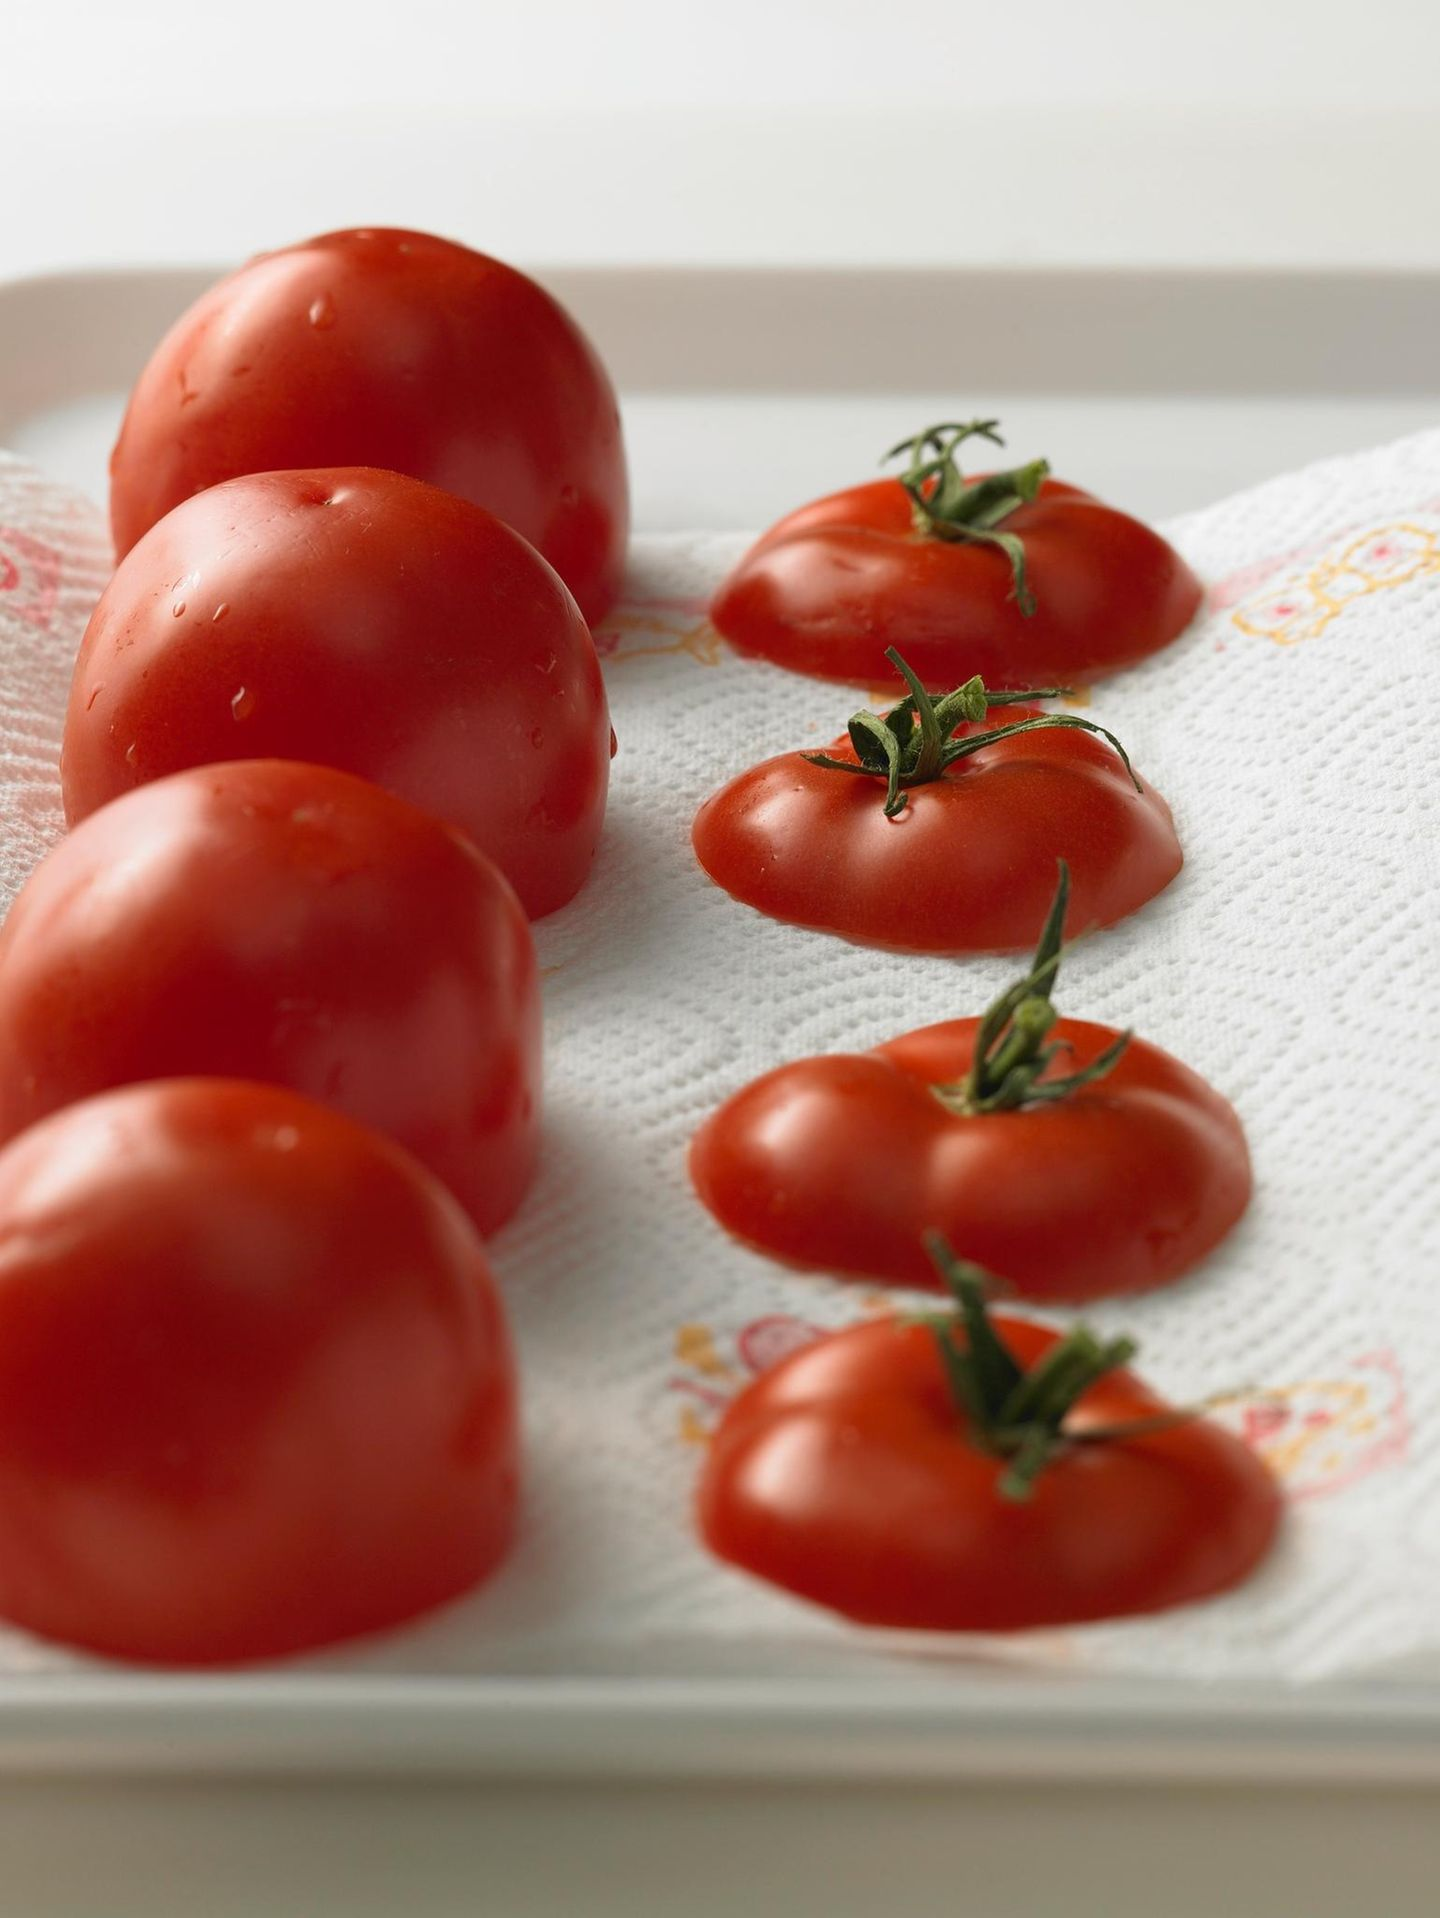 Tomaten abtropfen lassen